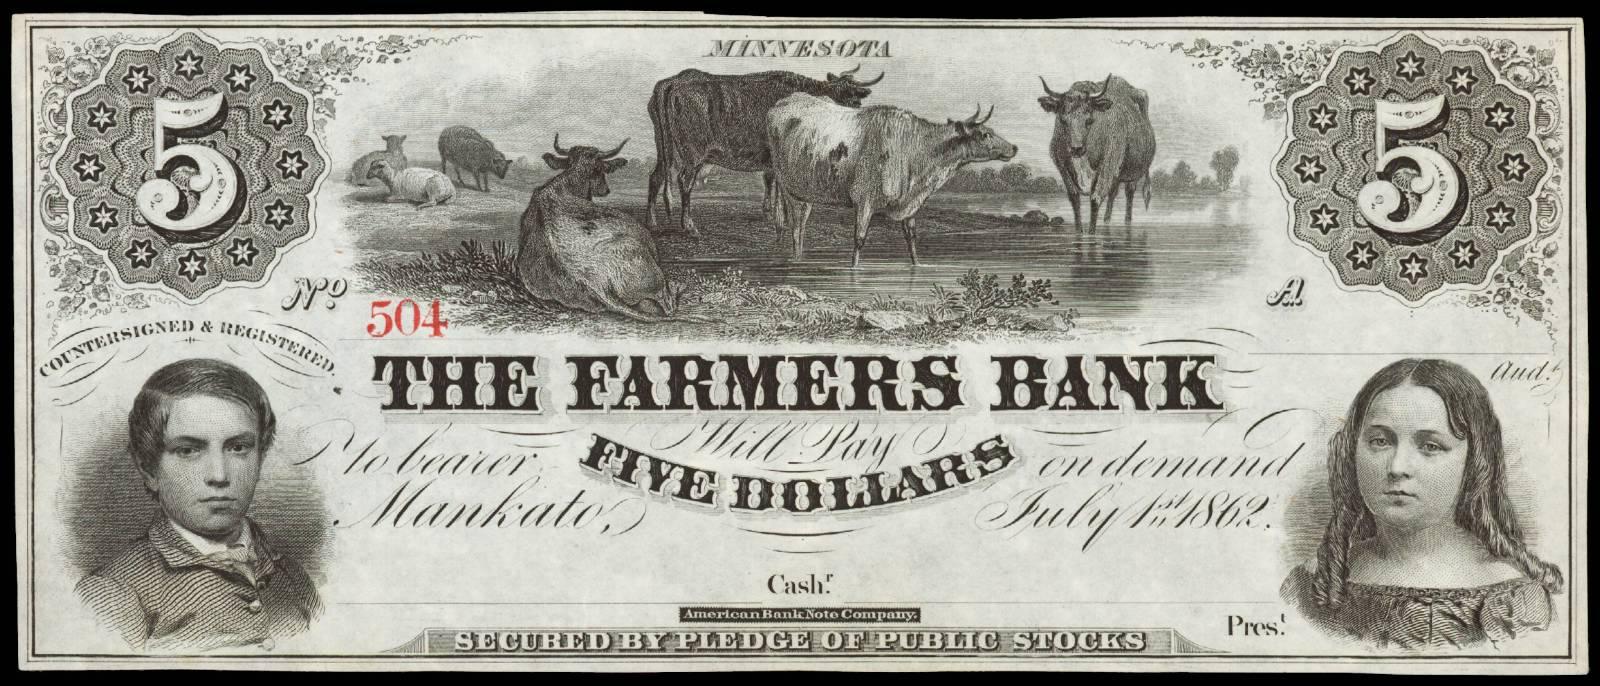 $5 Farmers Bank of Mankato